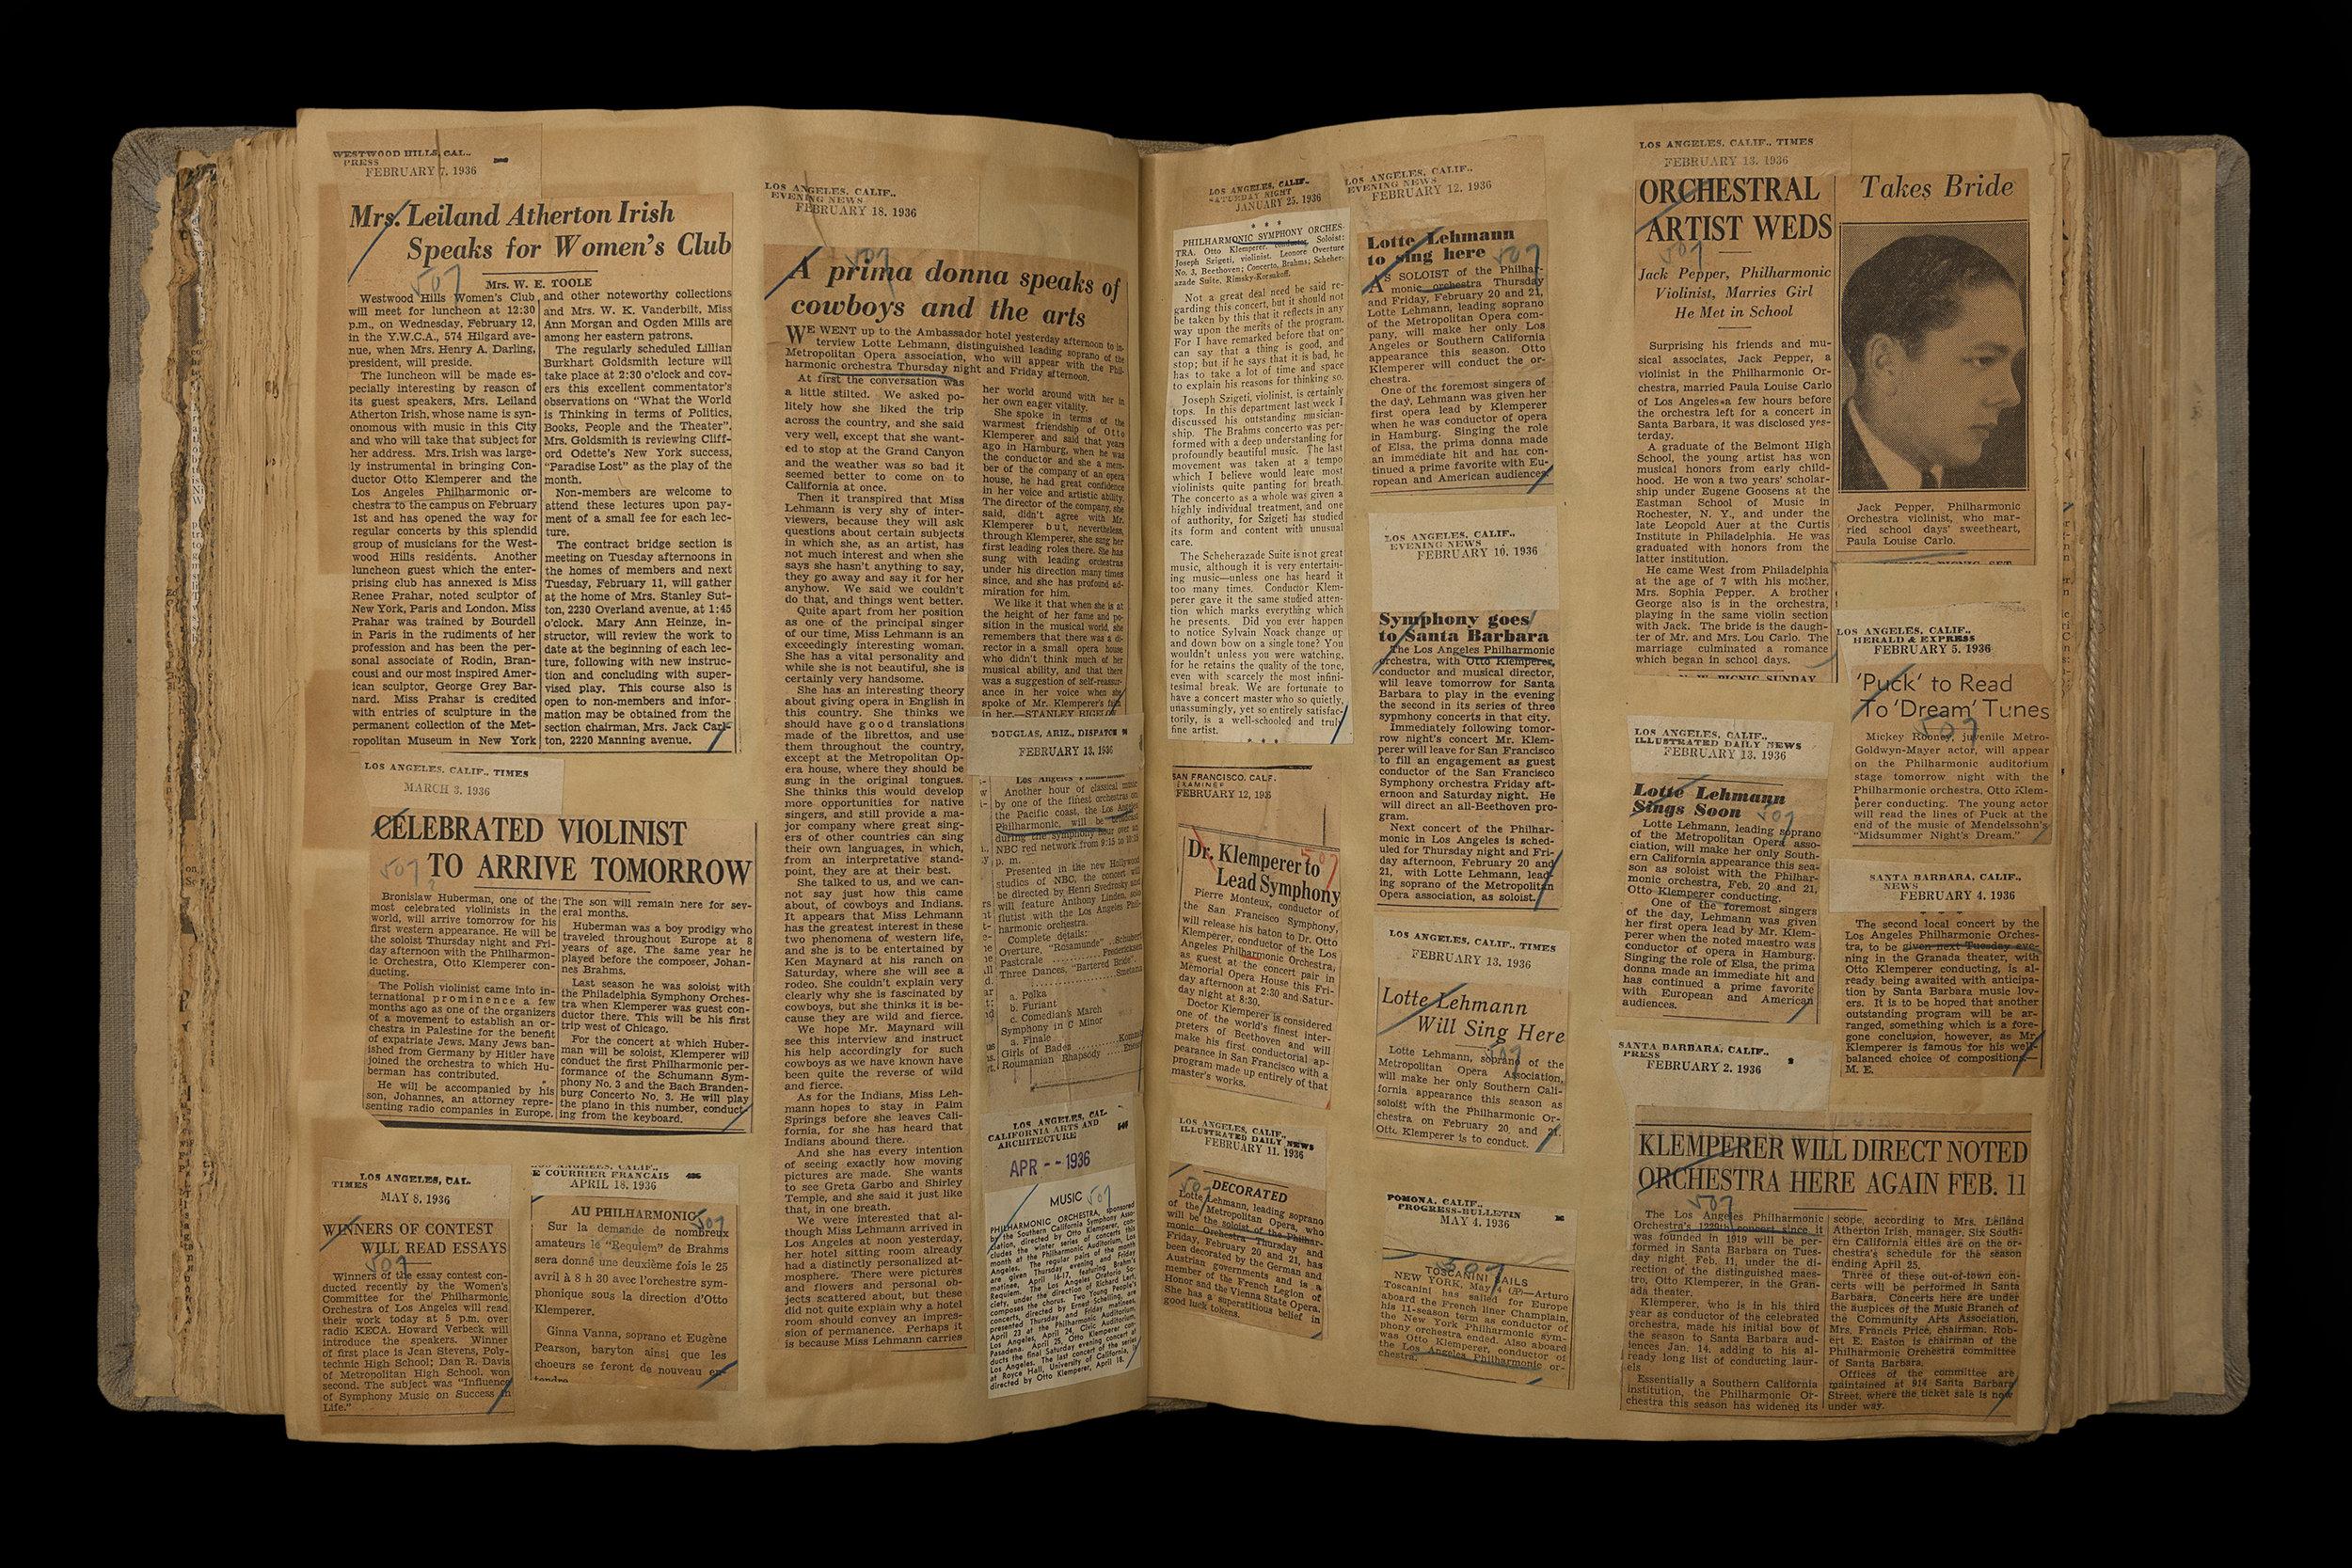 LAPOScrapbook_PageG_B0696_1935-1936.jpg